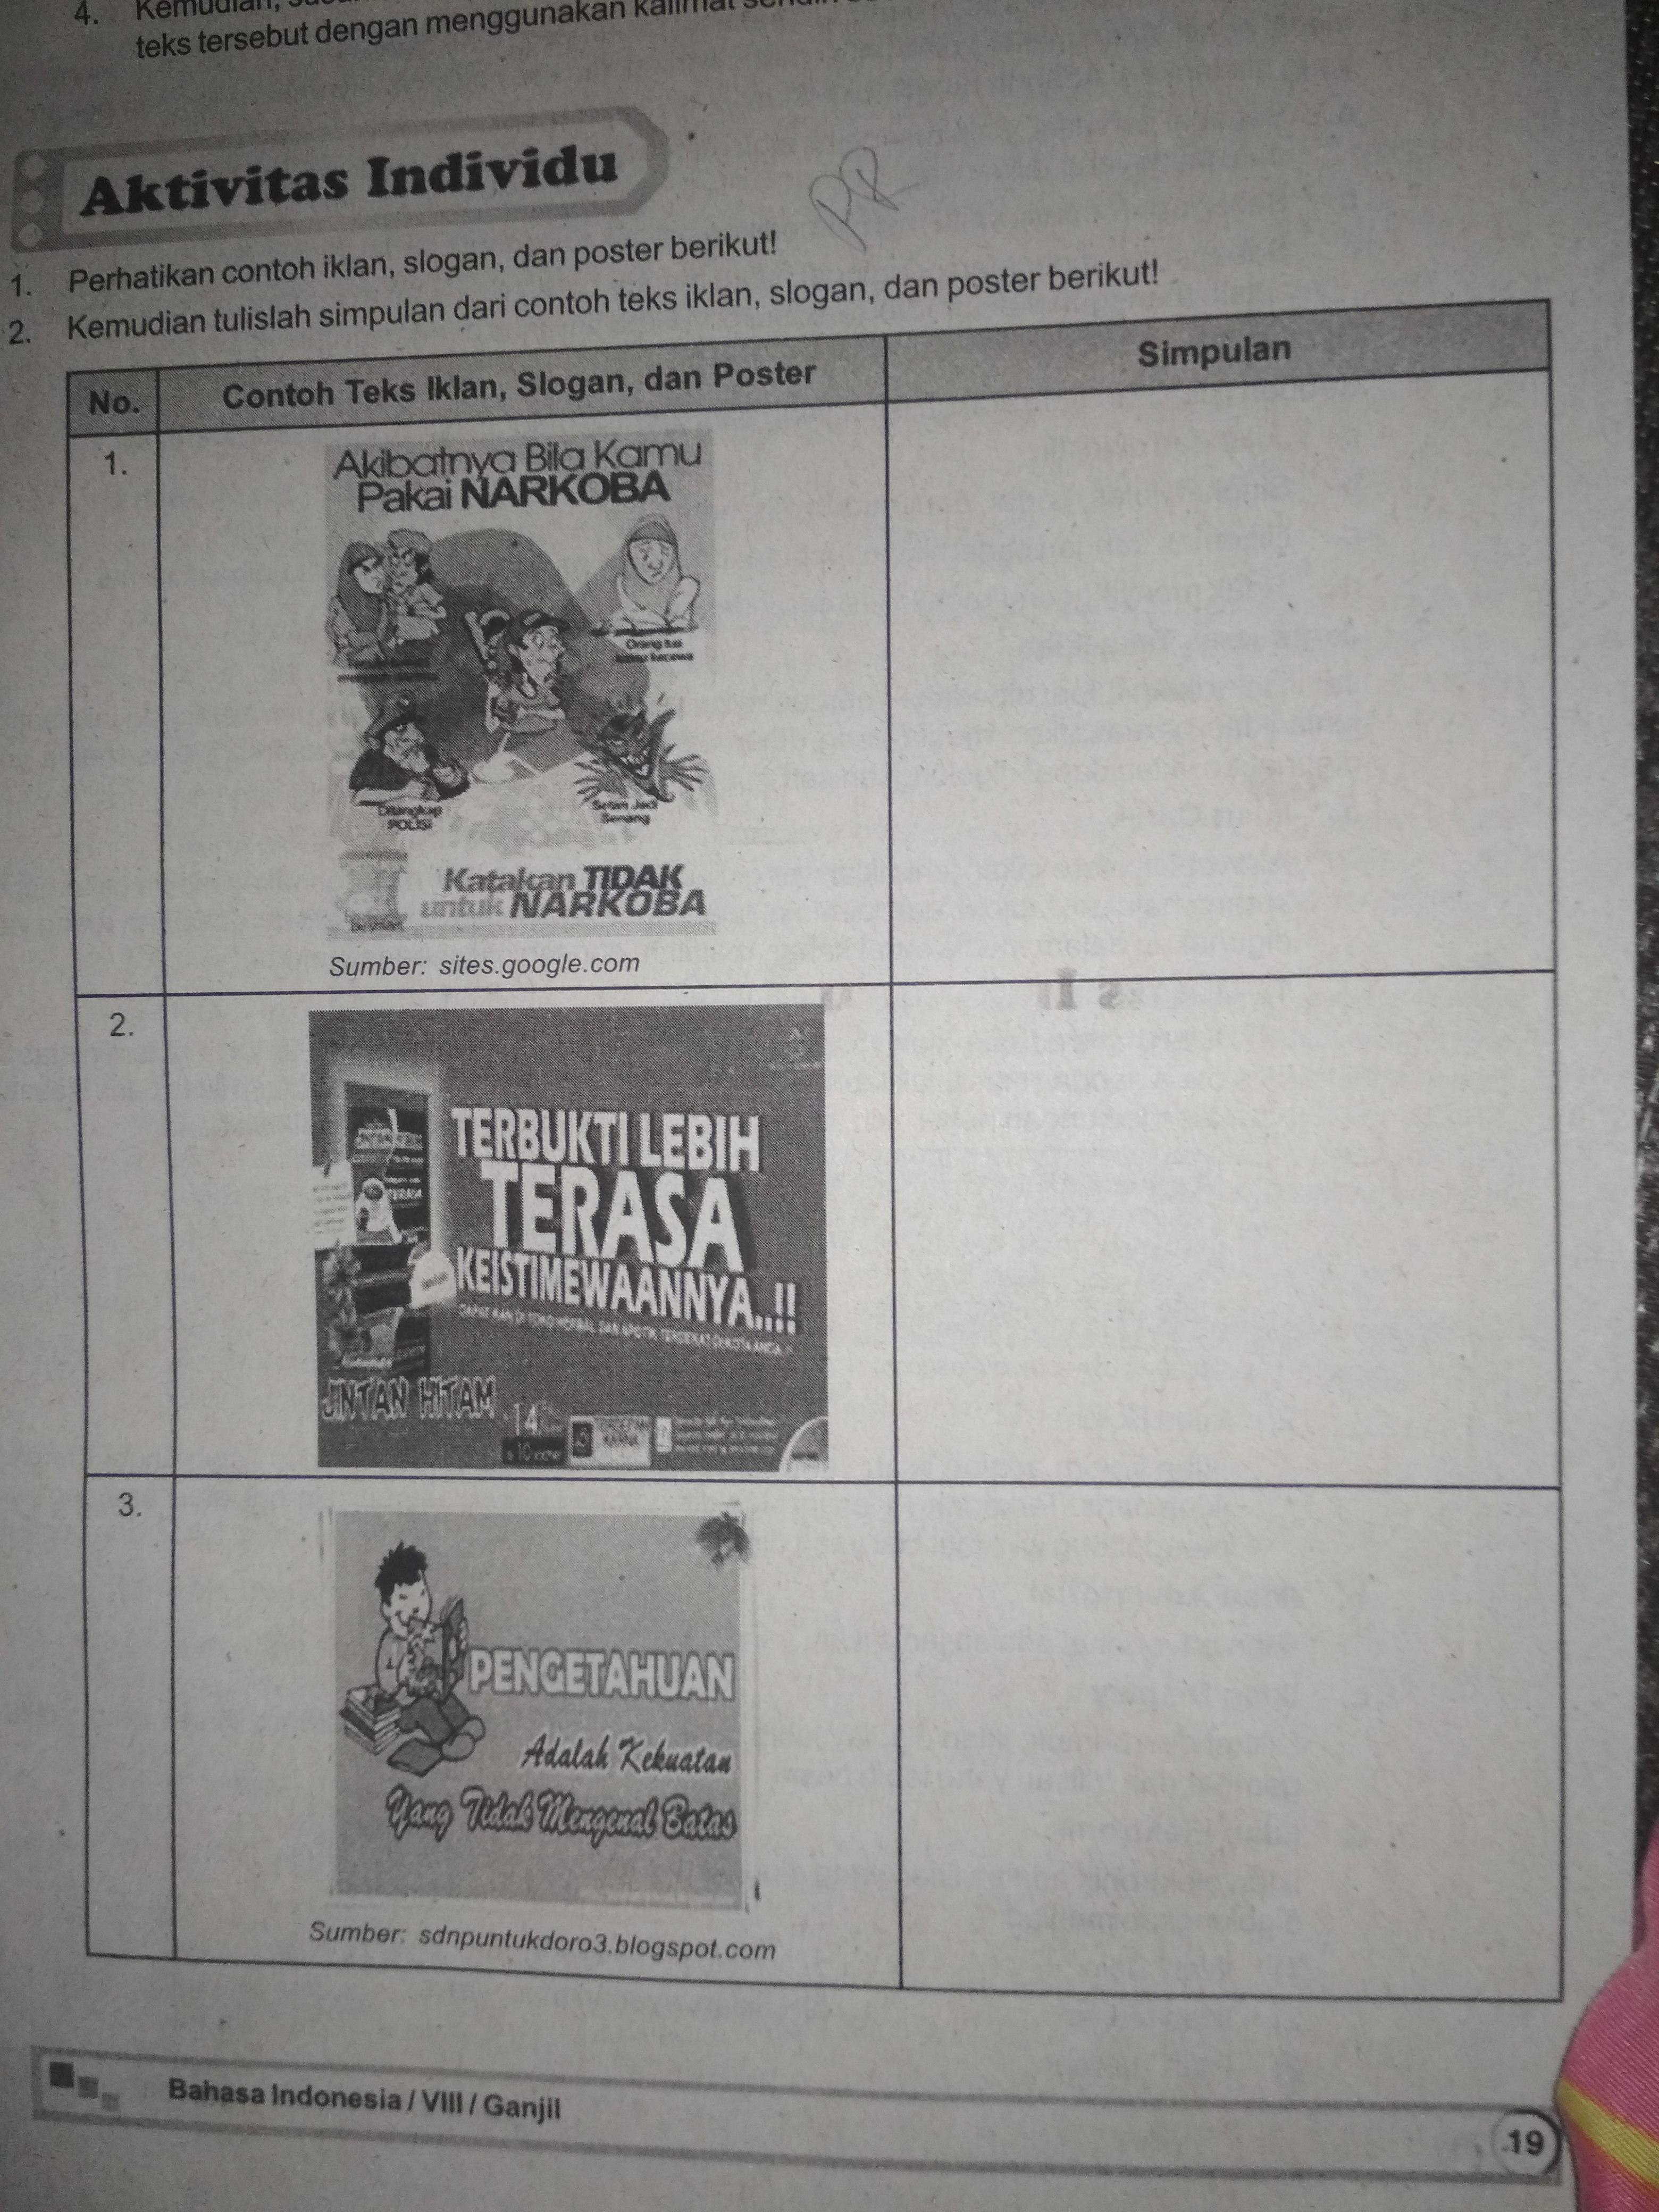 Materi Pelajaran 9 Contoh Gambar Iklan Slogan Dan Poster Serta